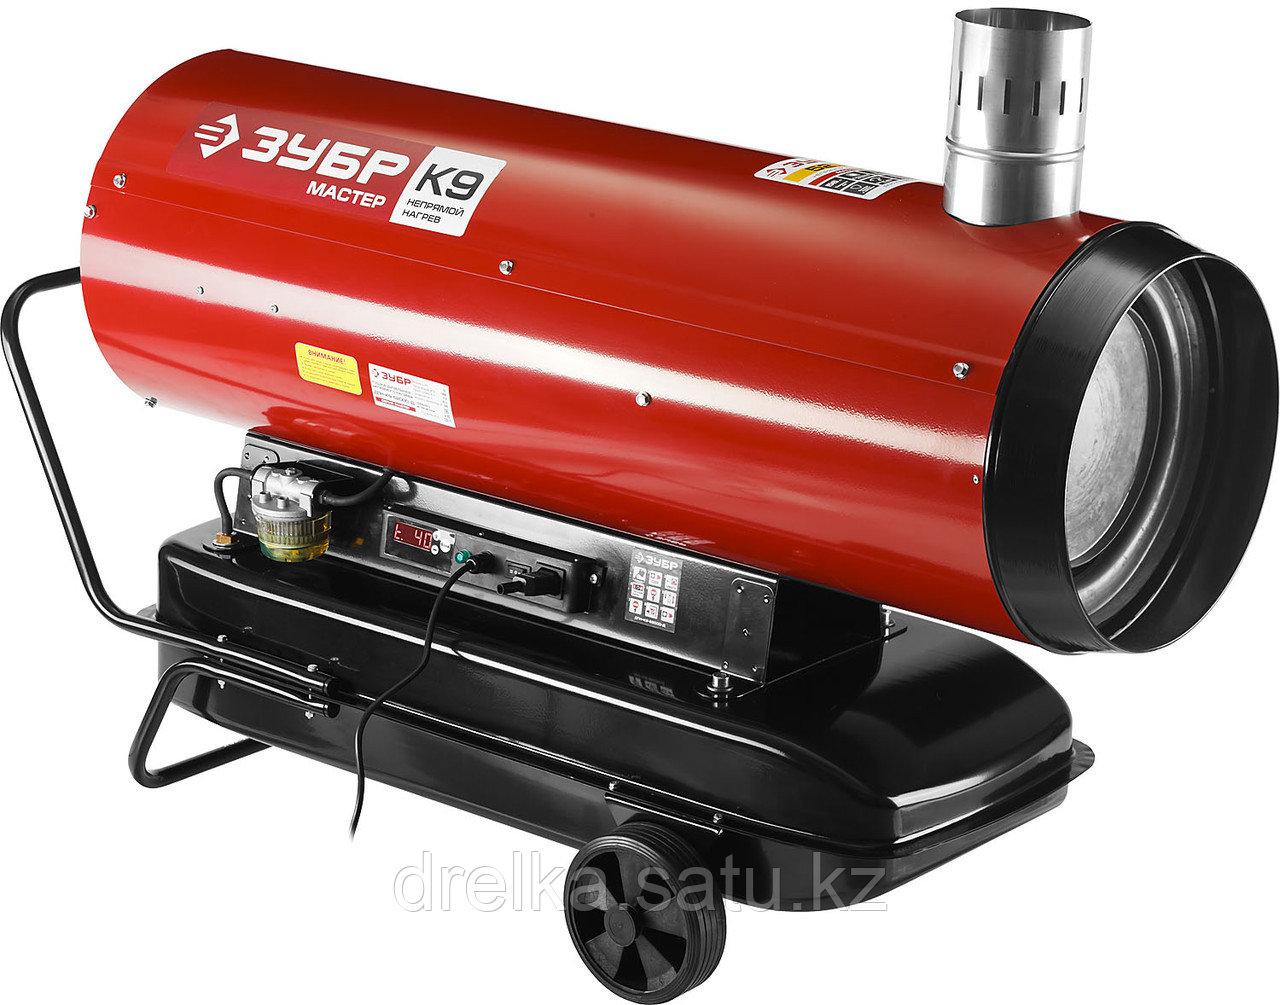 Дизельная тепловая пушка ЗУБР ДПН-К9-52000-Д, МАСТЕР, 220 В, 52,0 кВт, 1800 м.кв/час, 55,5 л, 3,6 кг/ч